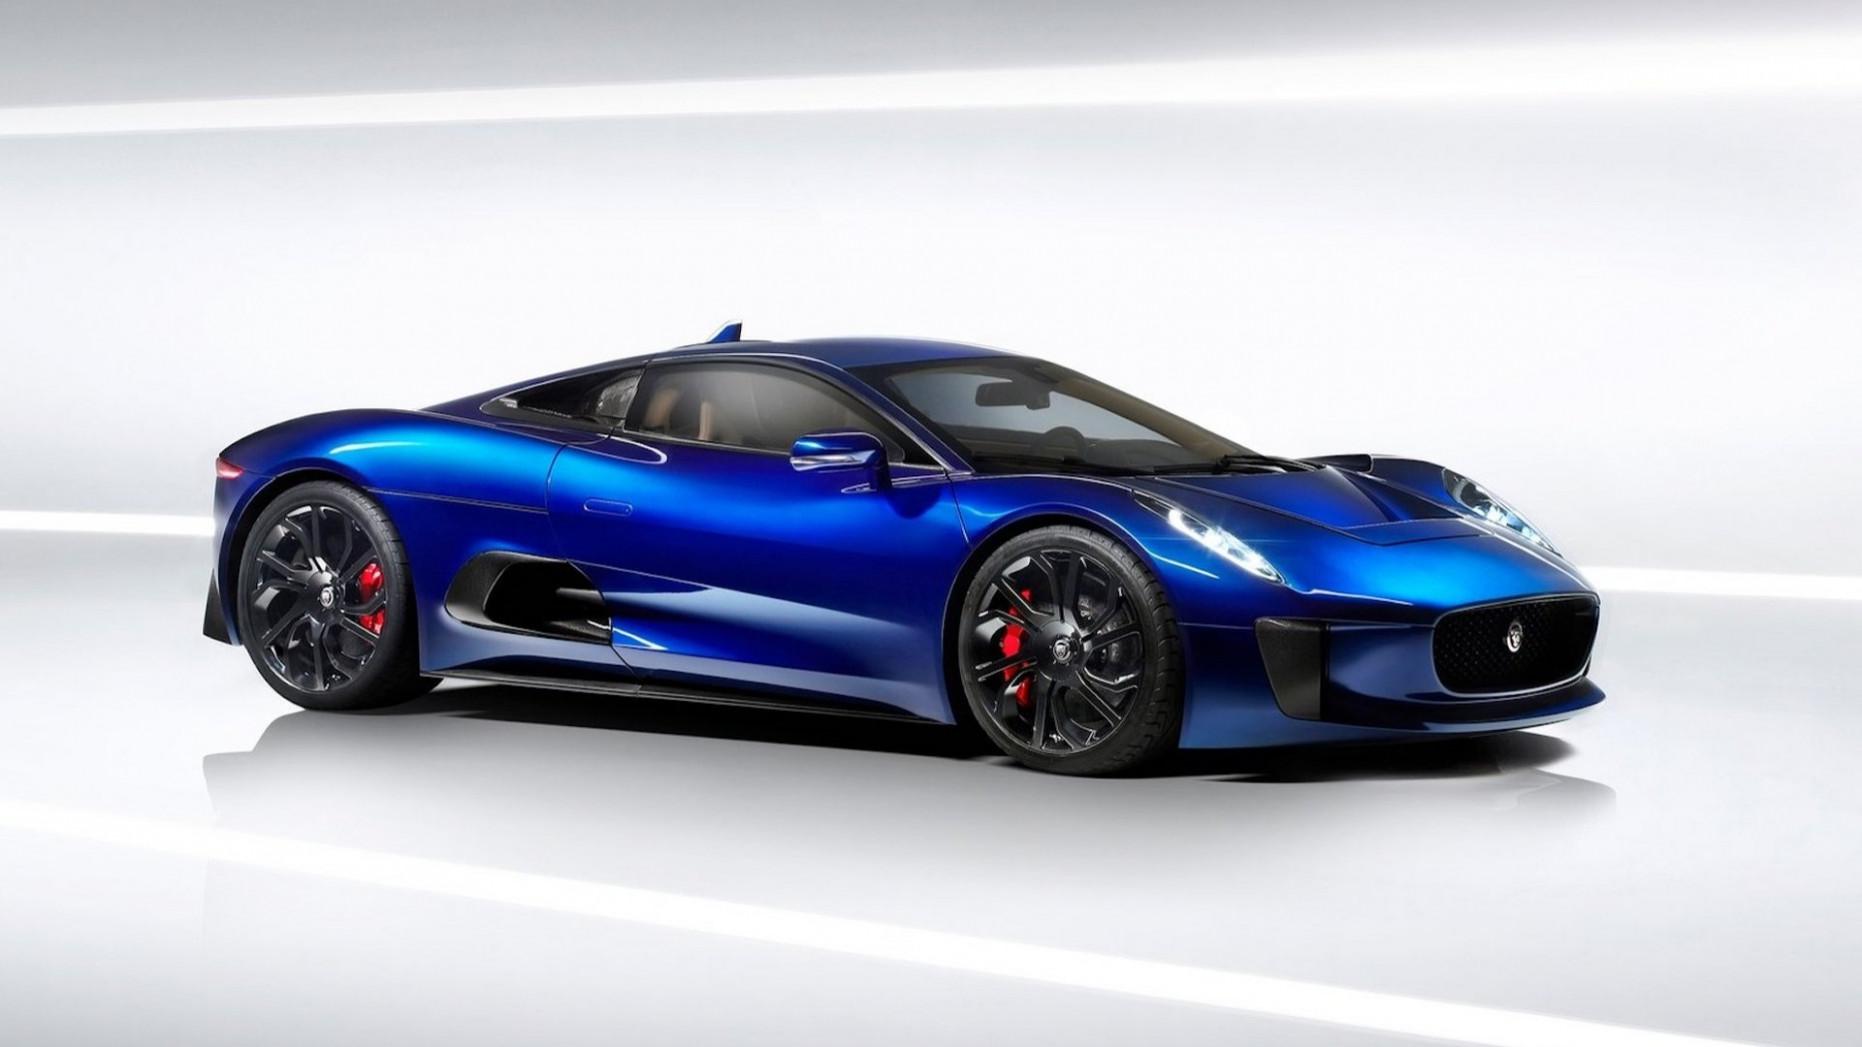 Redesign Jaguar J Type 2022 Price